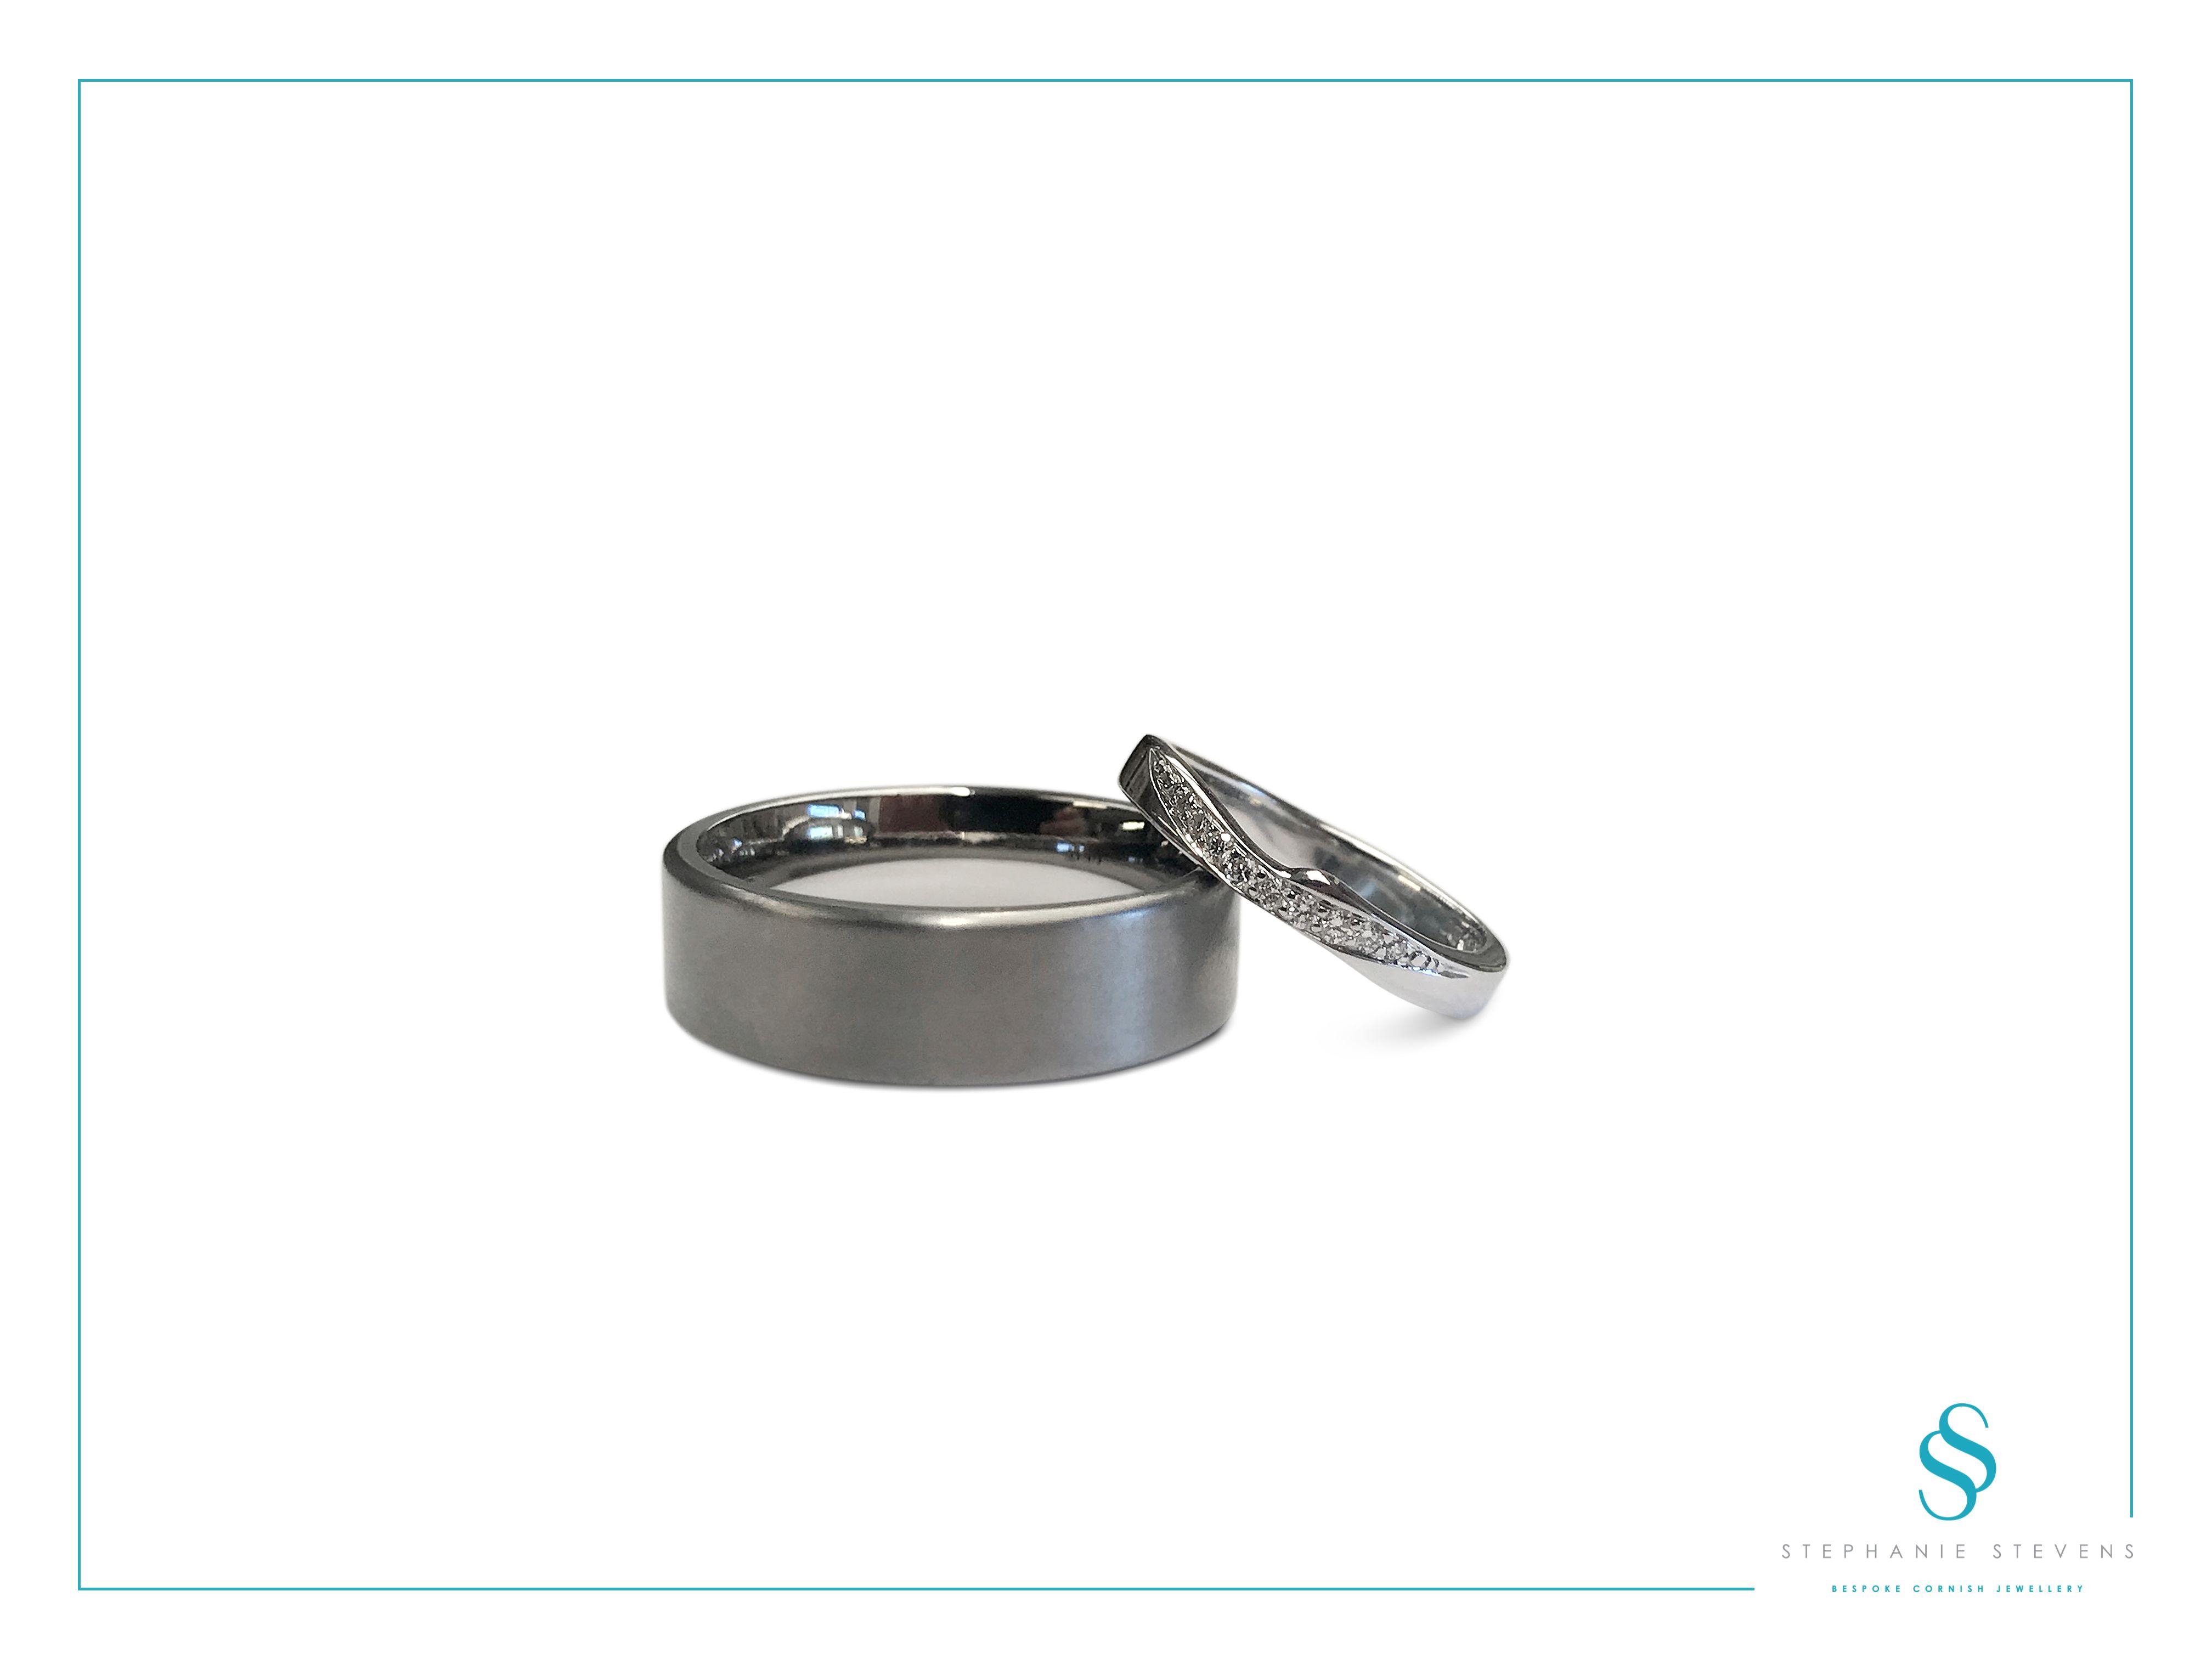 9ct White Gold curved wedding band, micro pavé diamonds